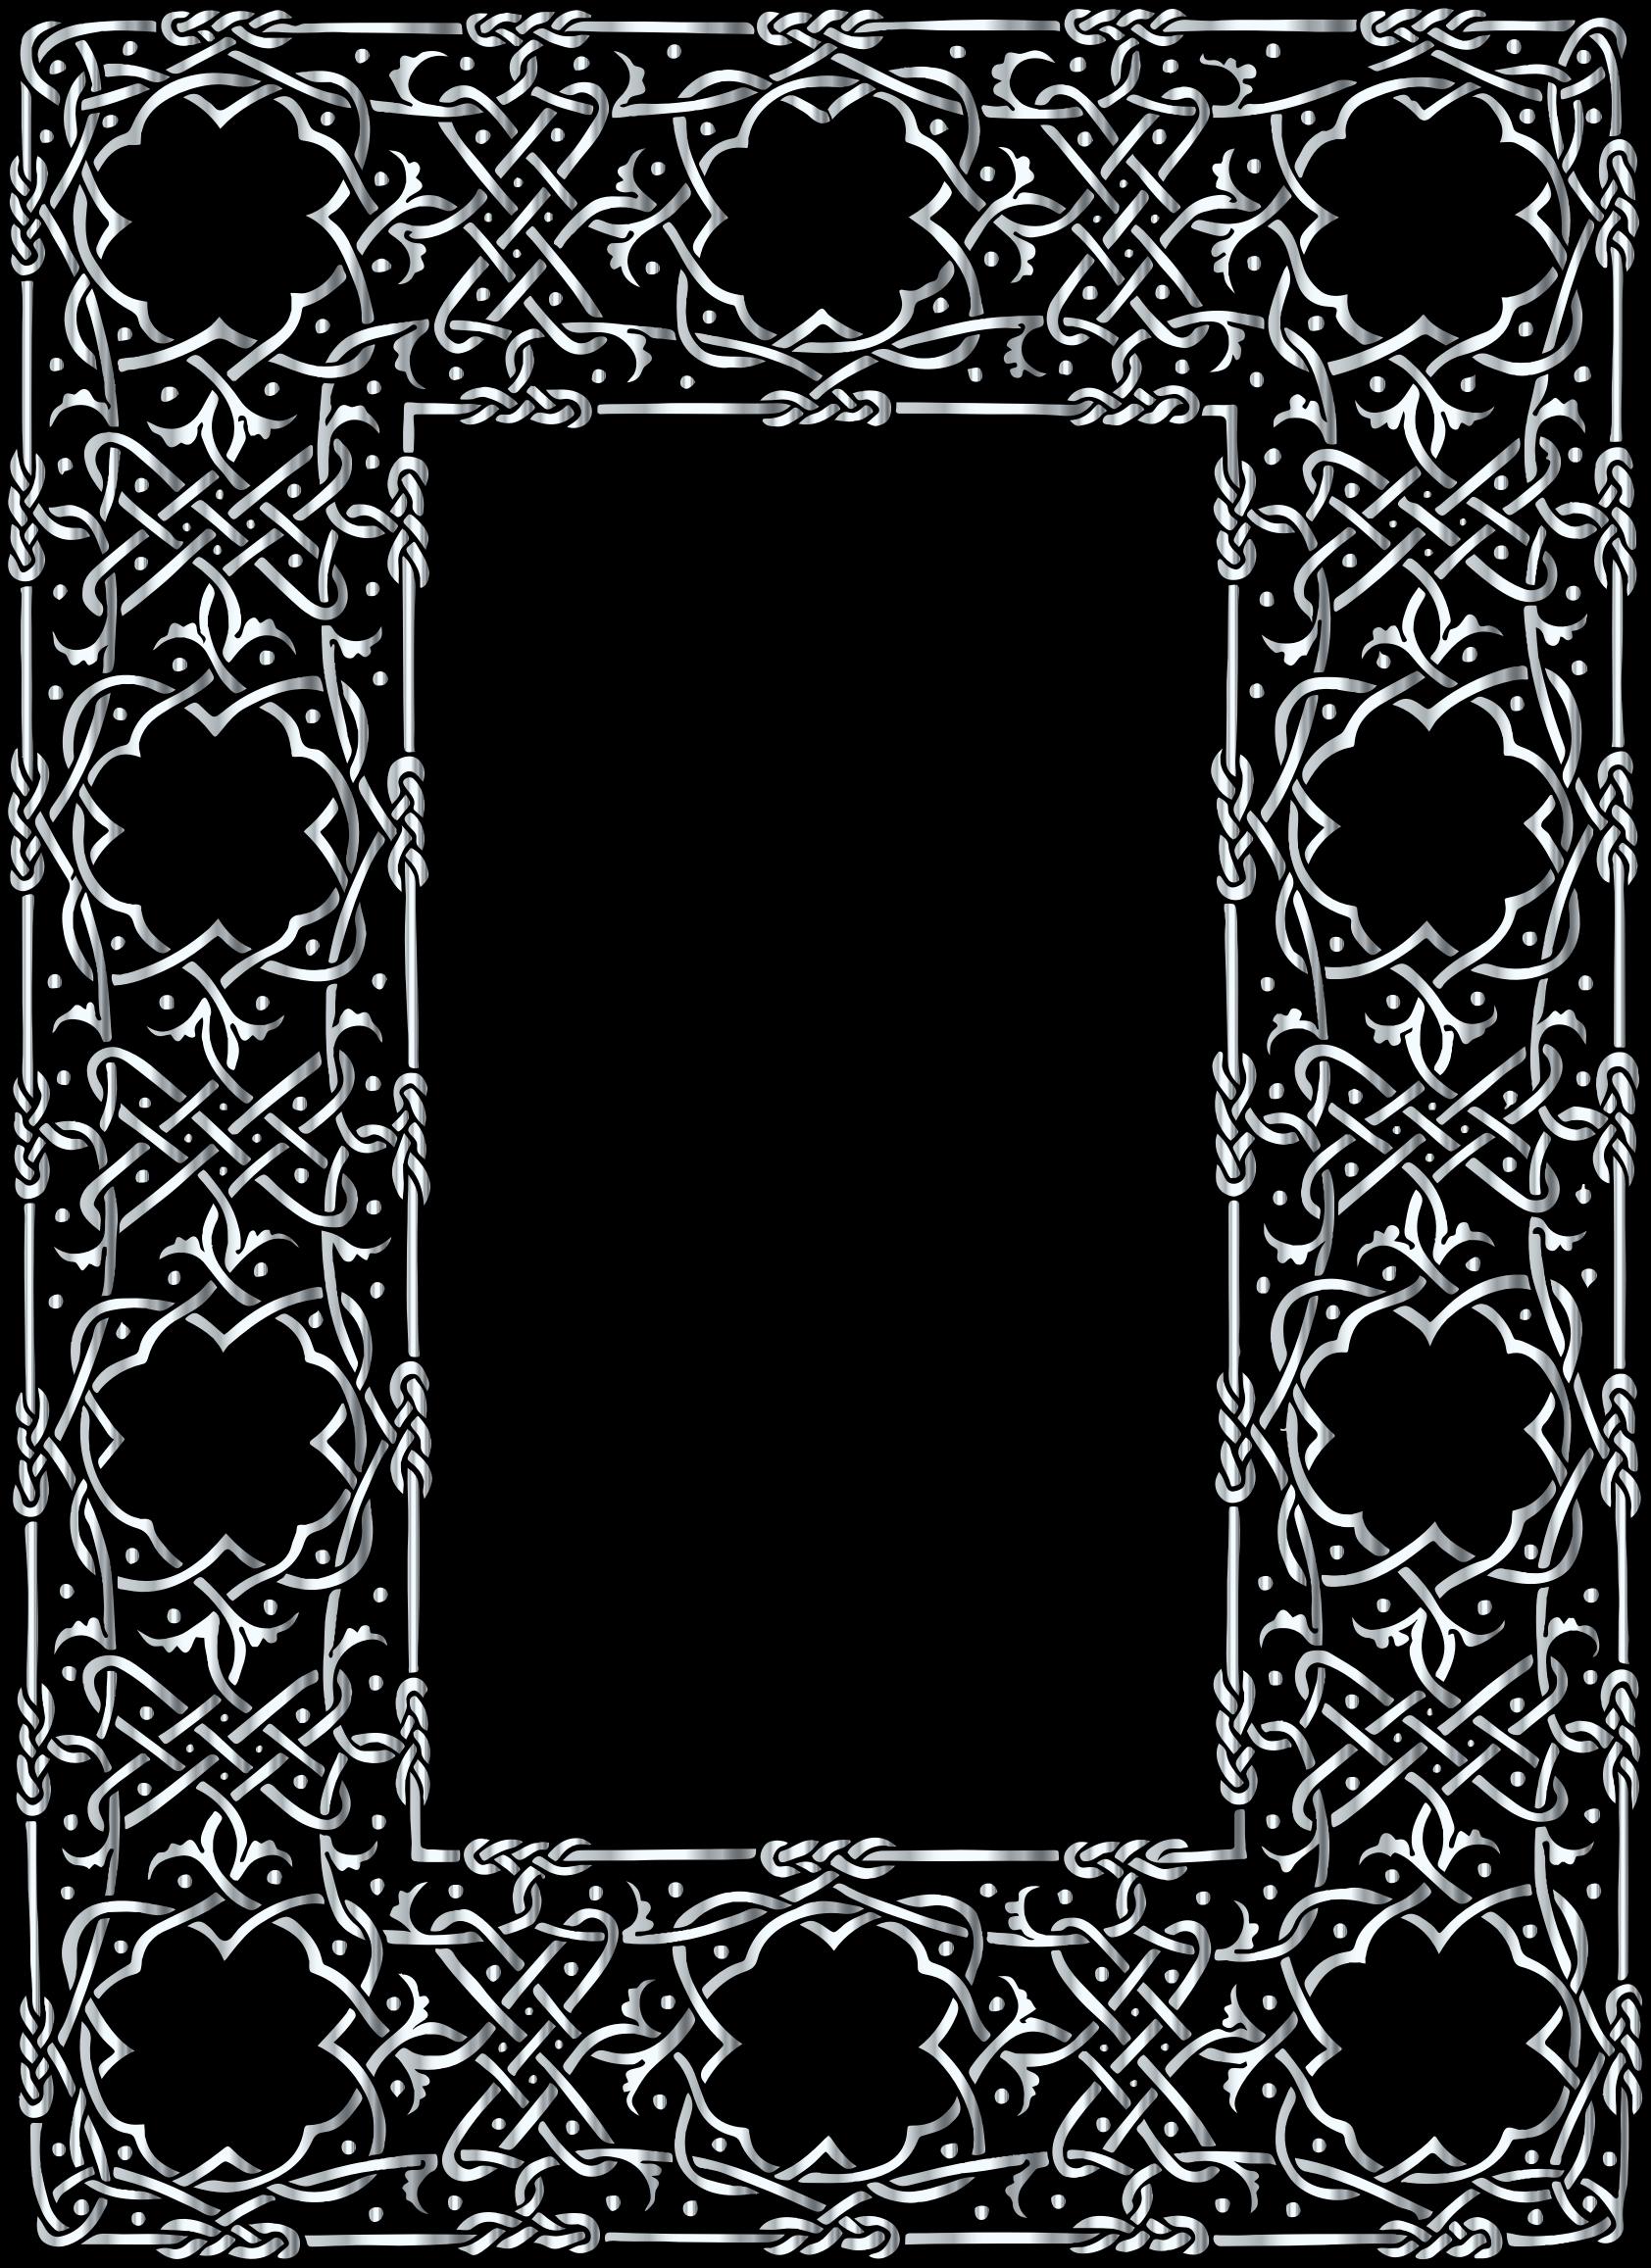 Frame clipart silver. Ornate geometric big image